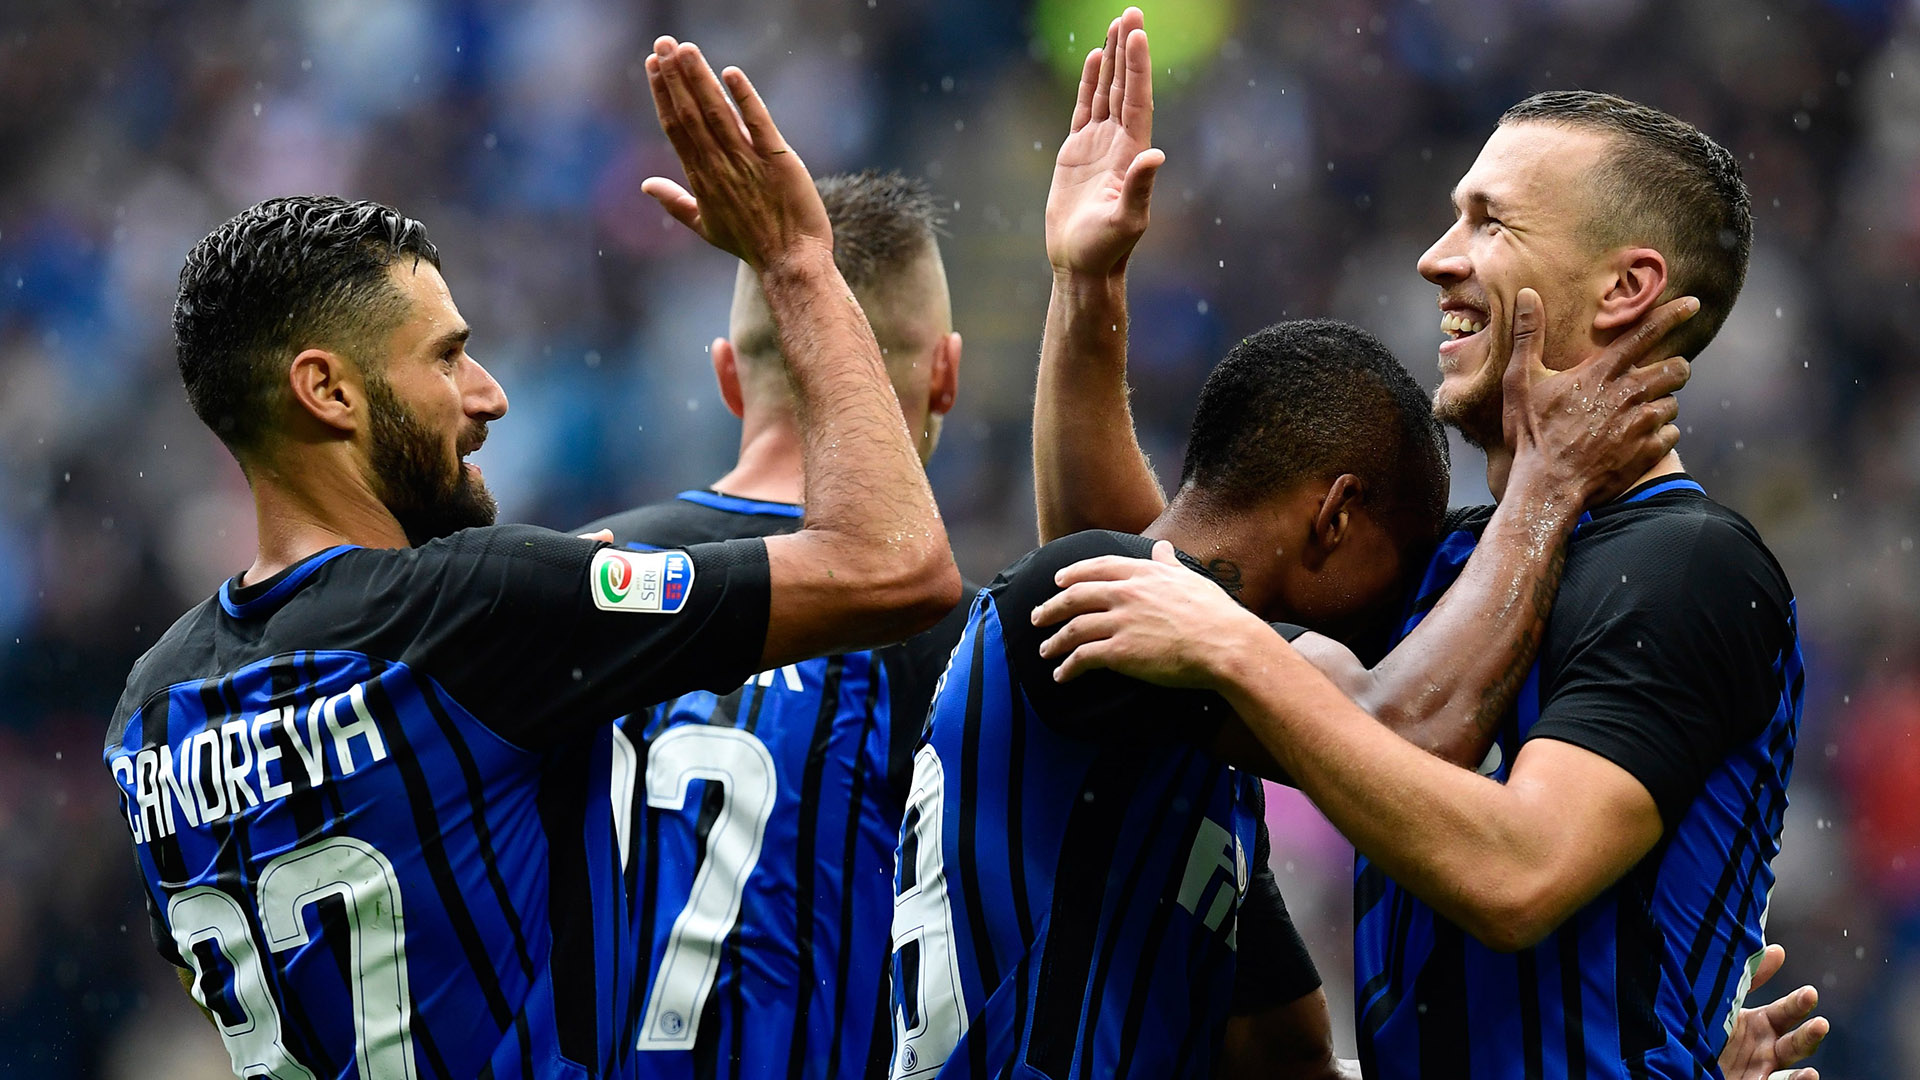 Candreva Perisic Inter SPAL Serie A